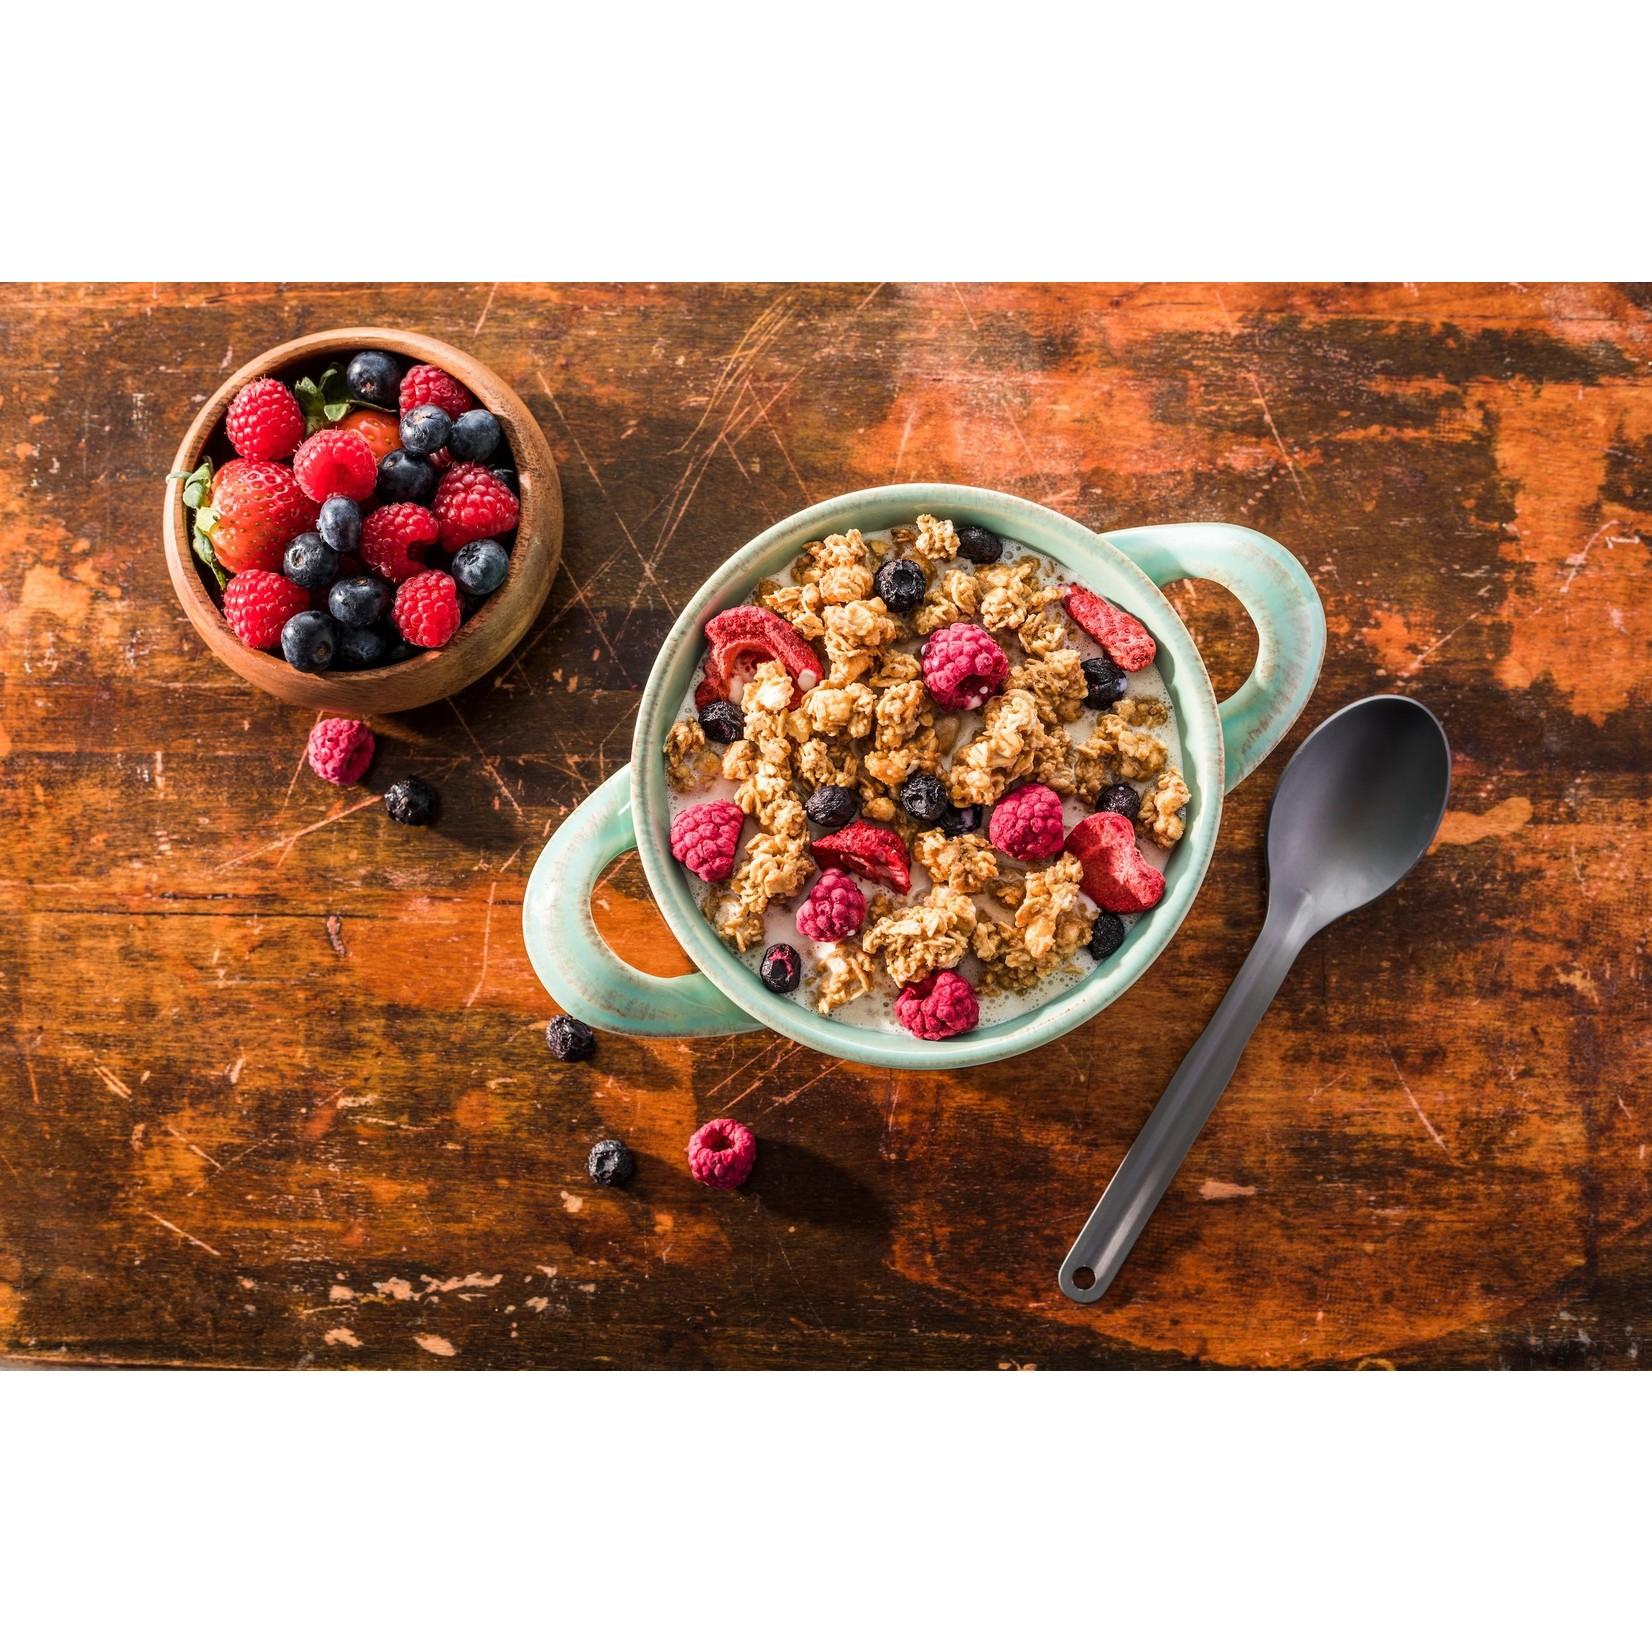 Peak Refuel Peak ReFuel Mountain Berry Granola Meal (Vegan)